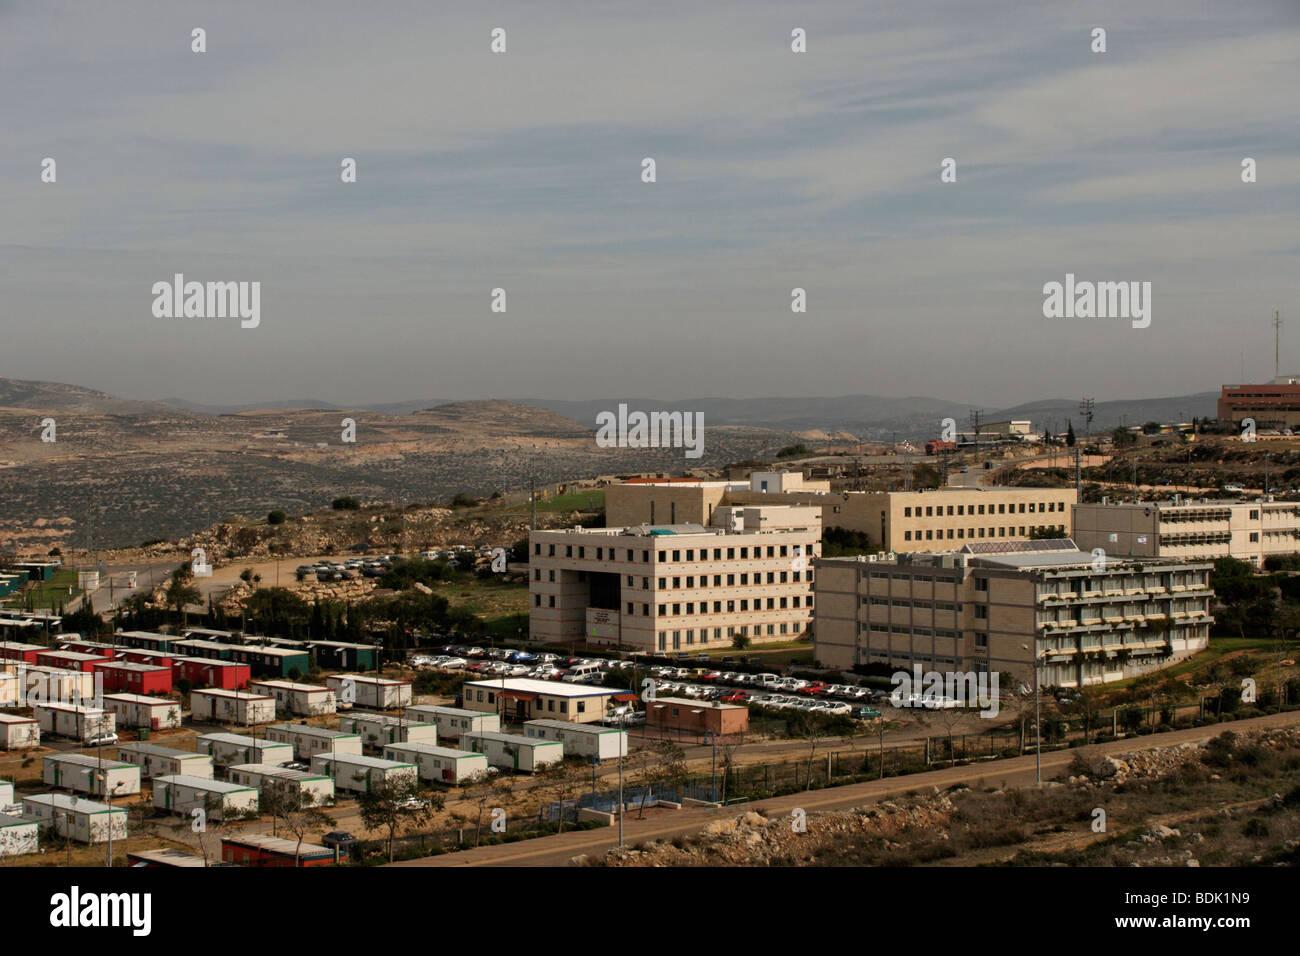 Ariel University Center of Samaria - Stock Image